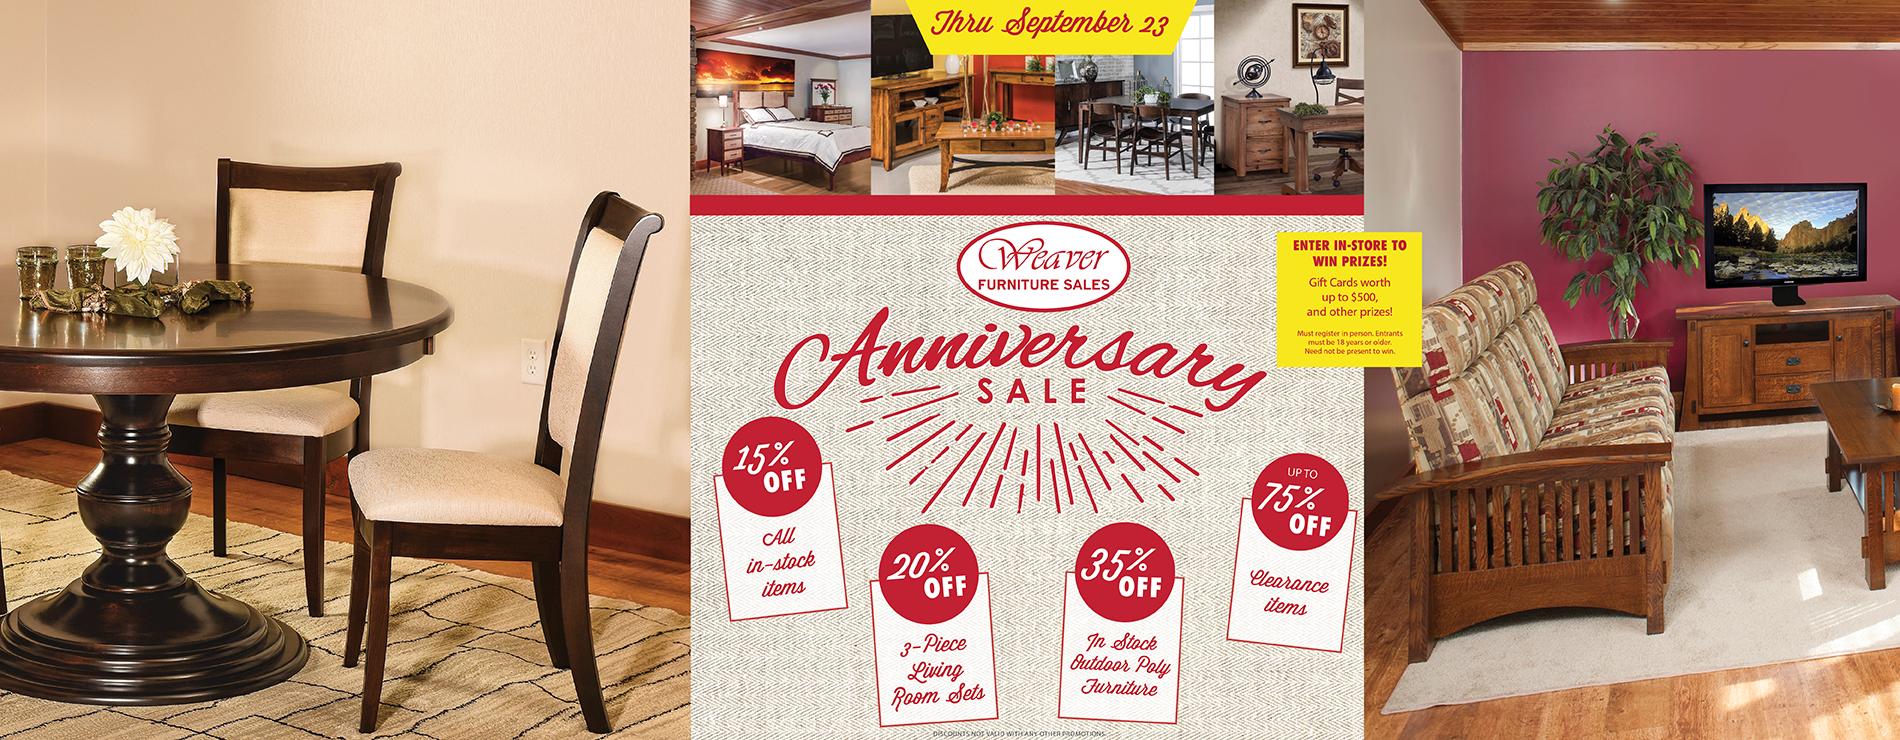 Weaver Furniture Sales 30th Anniversary Sale